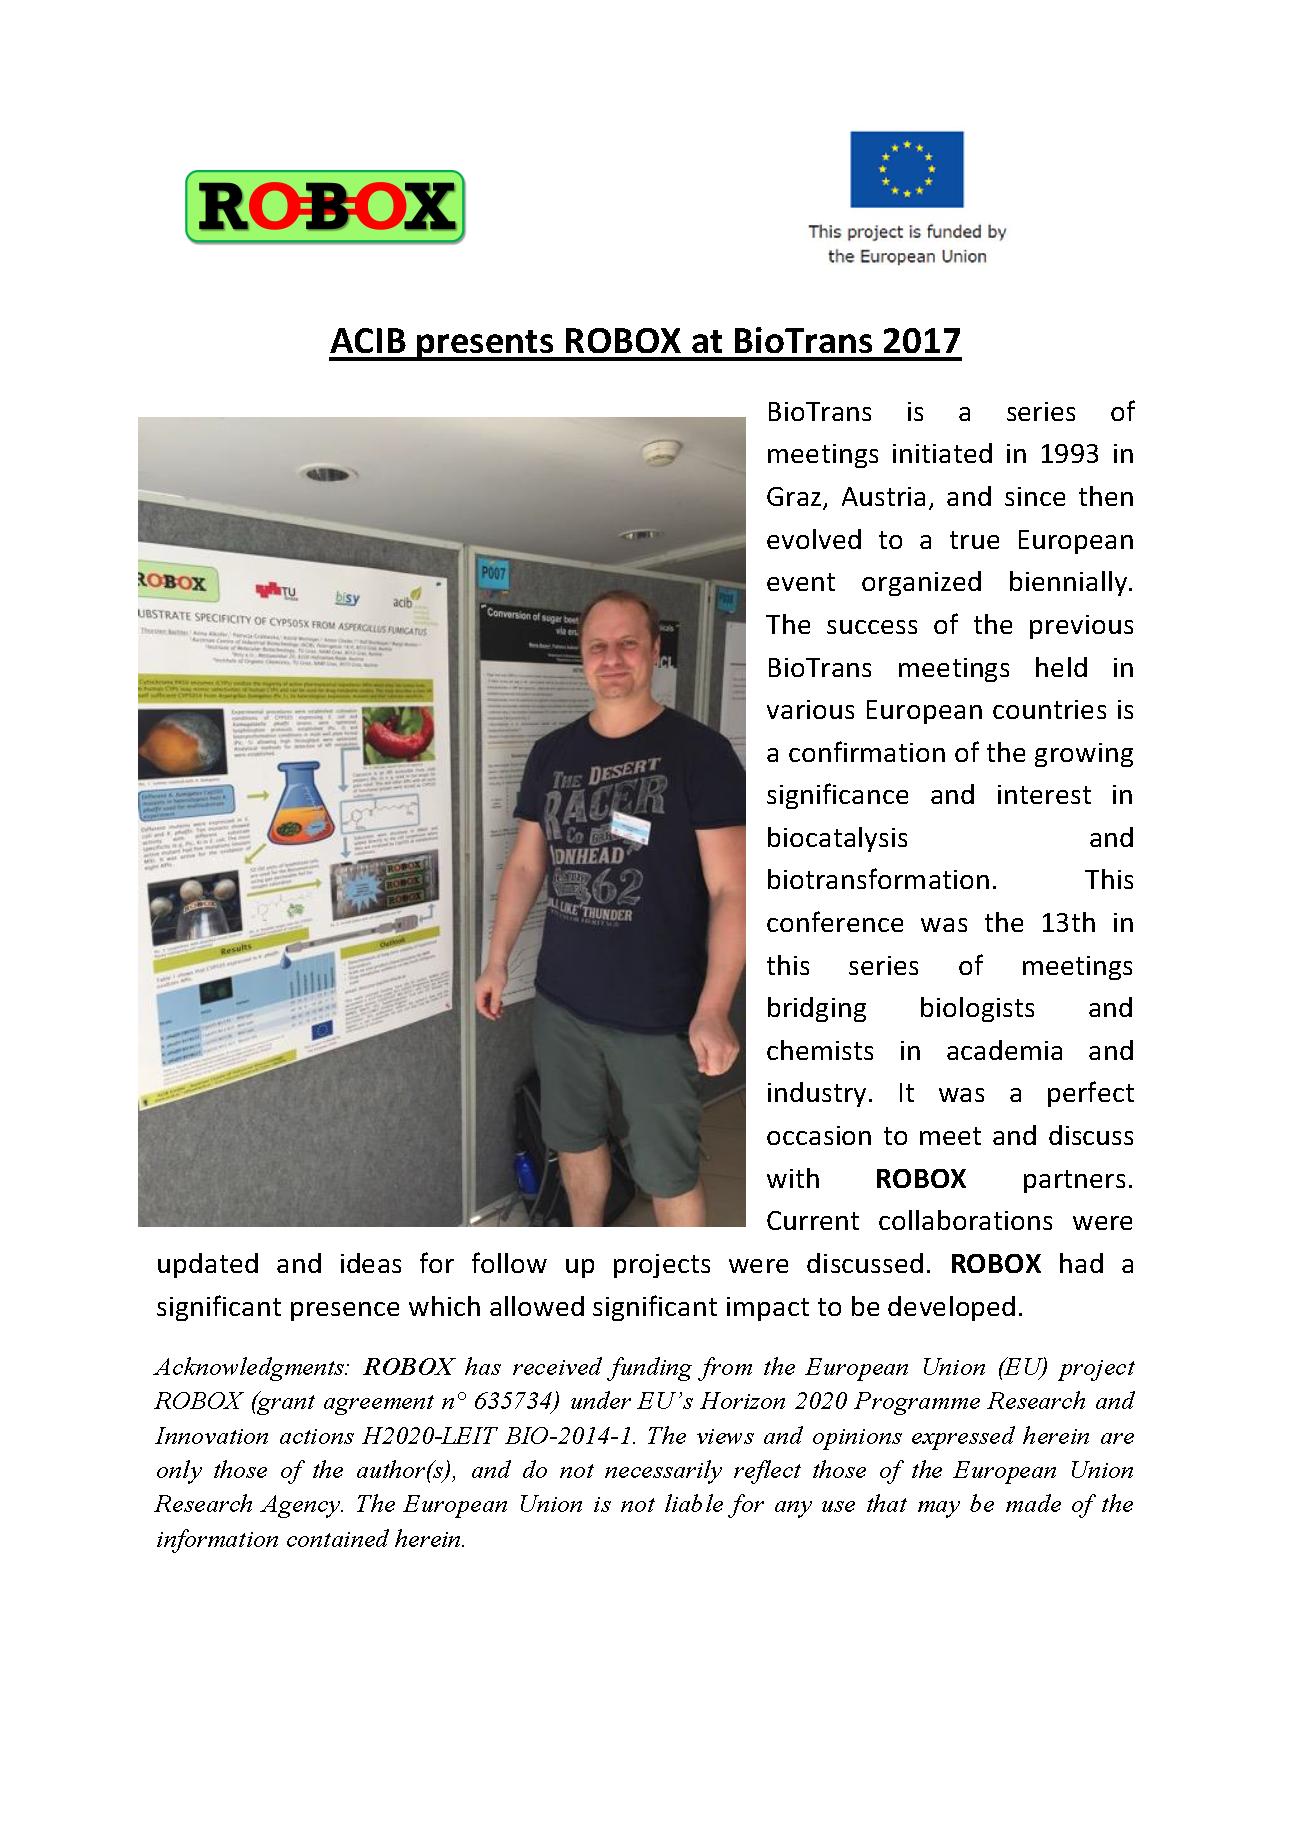 ACIB Presentation